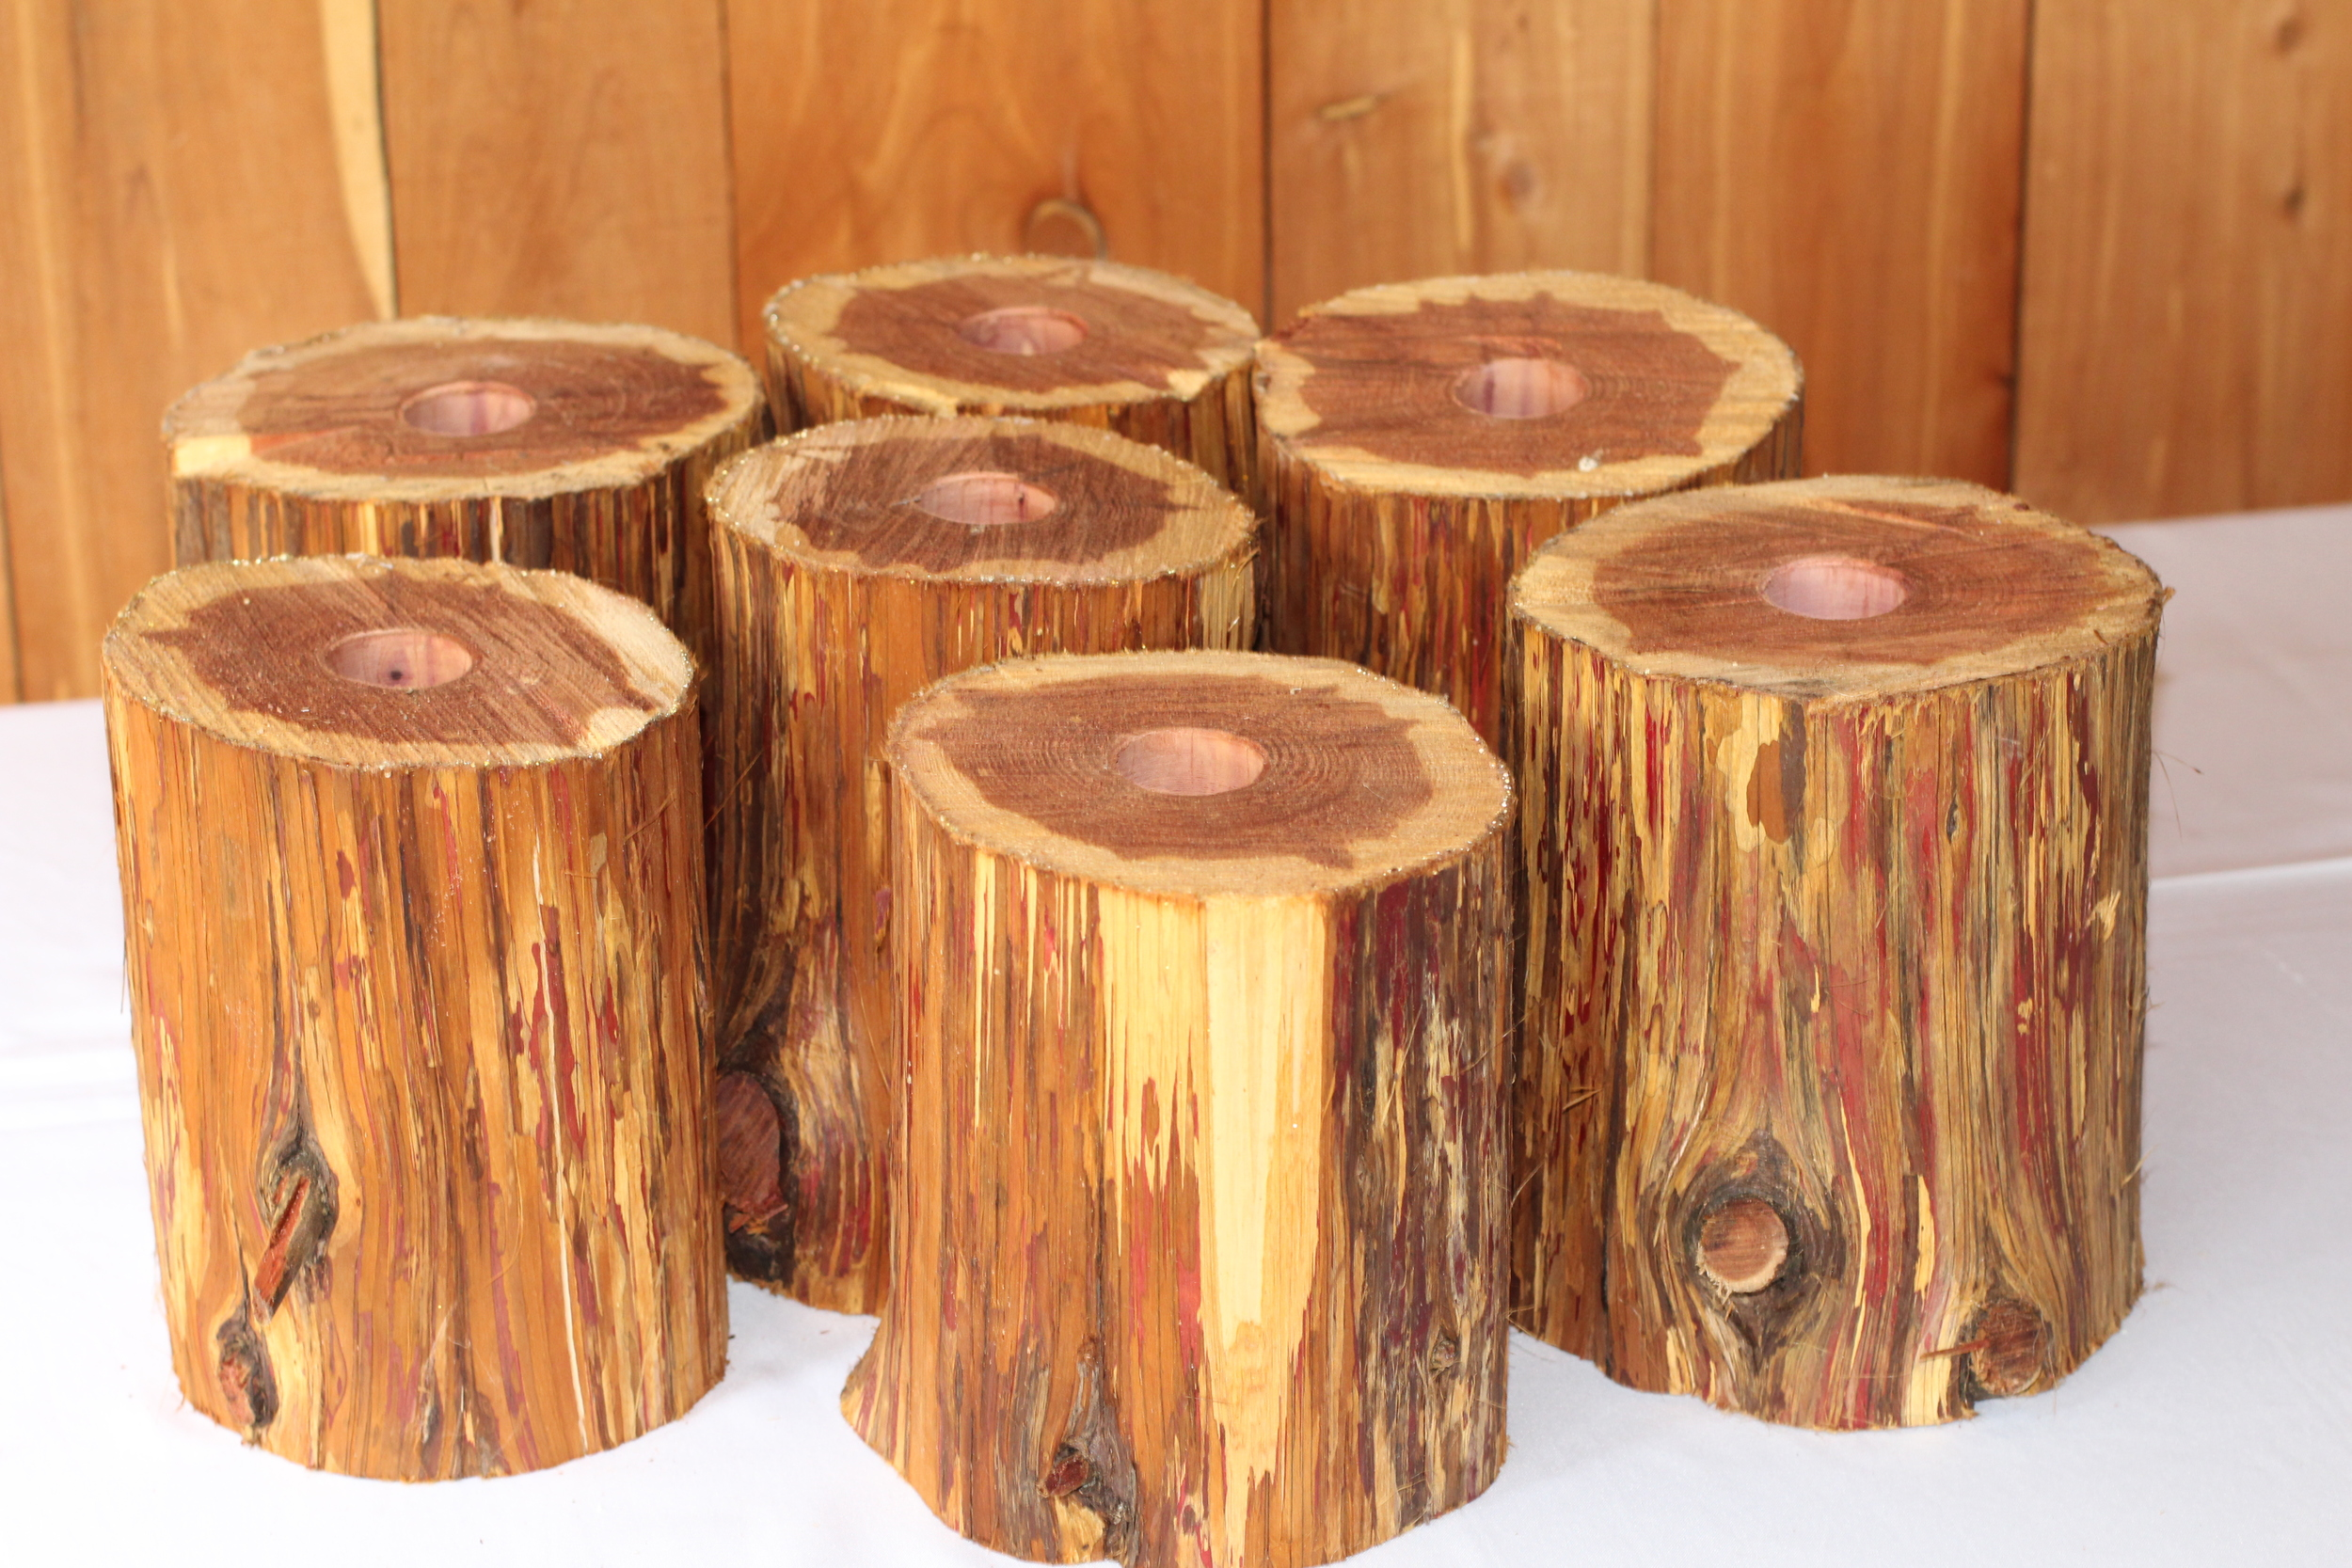 #127 - Hollowed Out Cedar Pieces